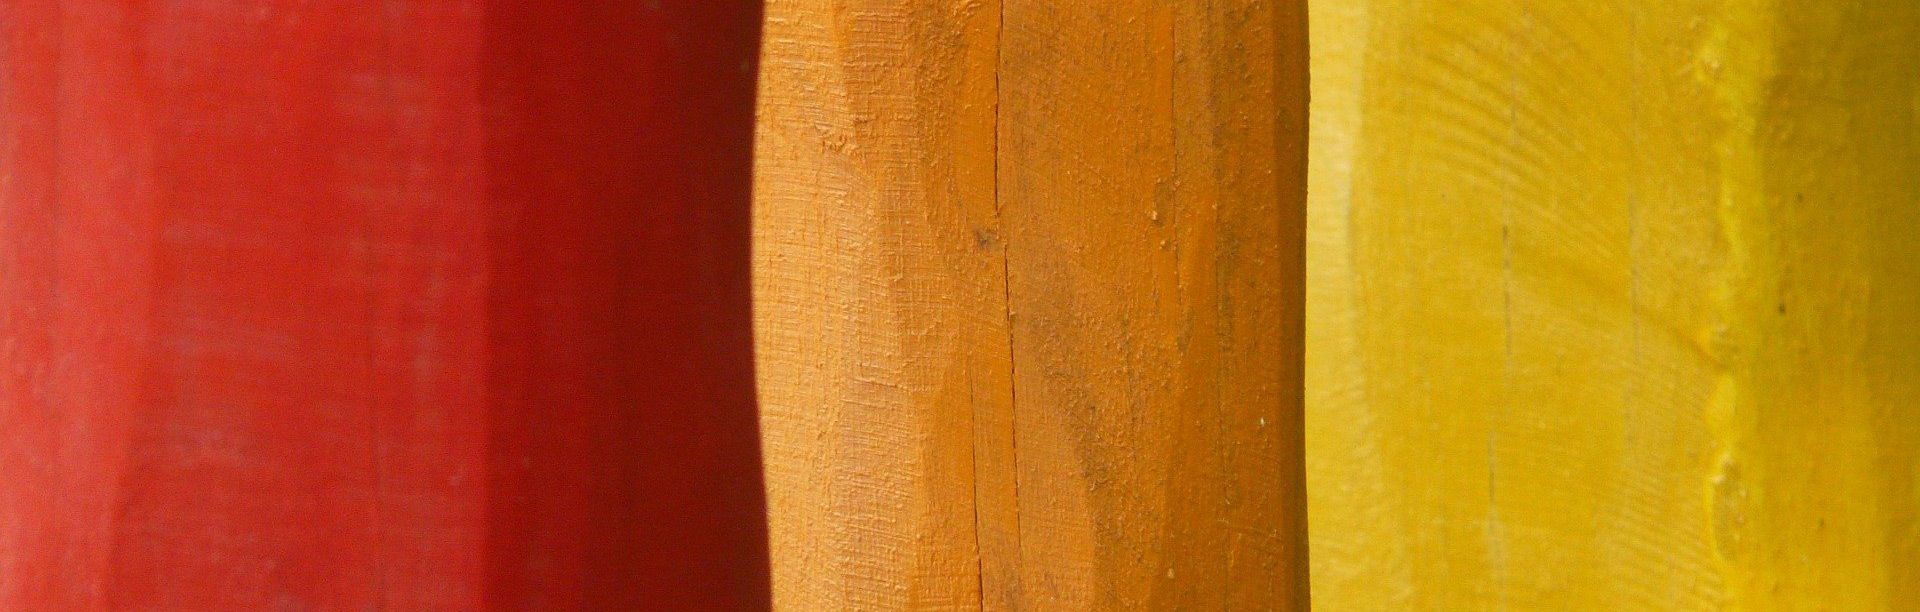 banner eZ Farben Holz